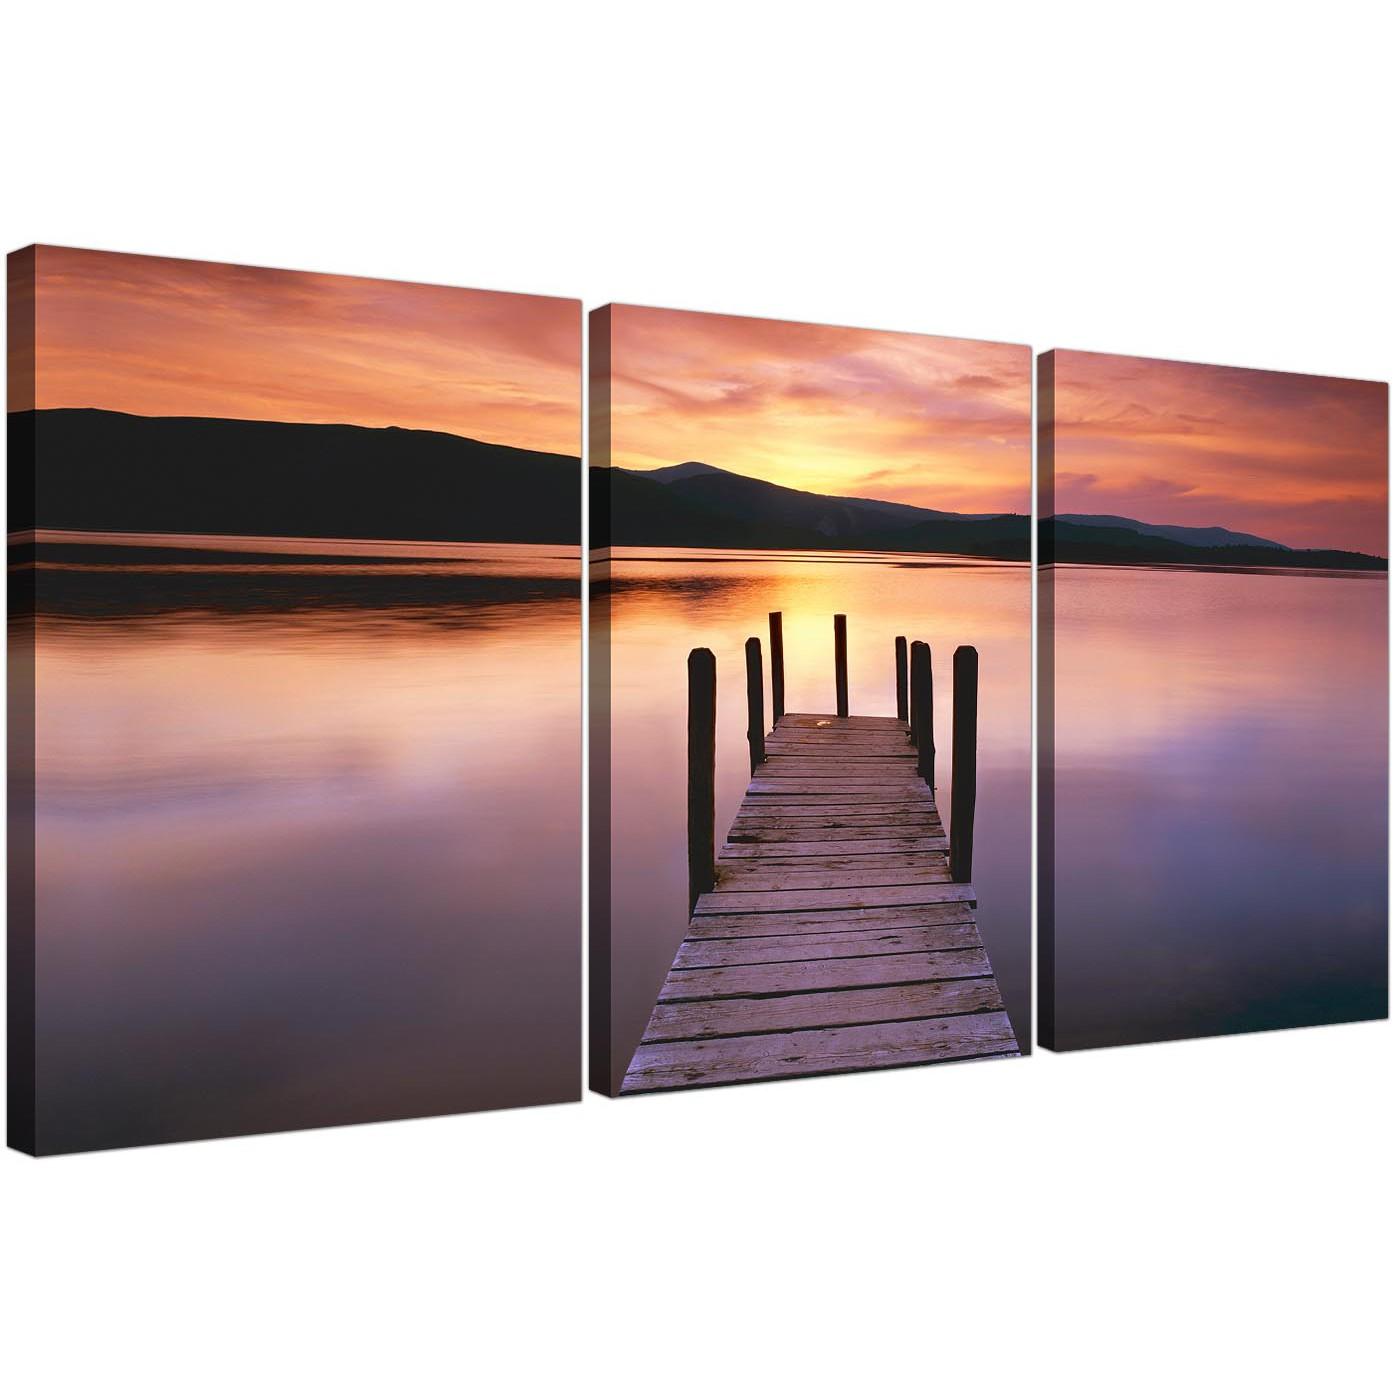 Lovely Set Of 3 Orange Landscape Canvas Prints Lake Sunset 3214 Display Gallery  Item 1 ...